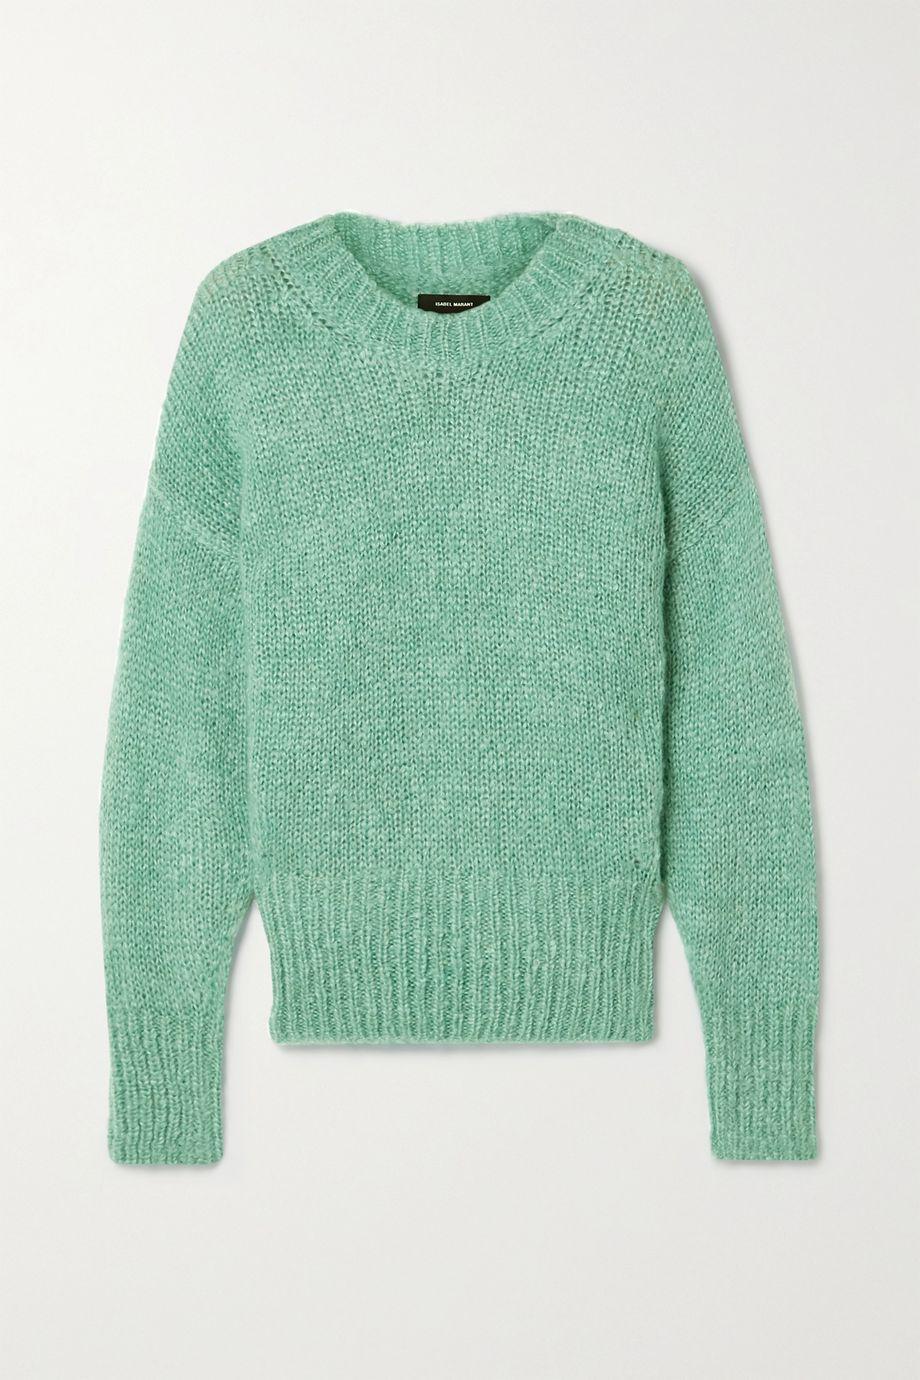 Isabel Marant Estelle mohair-blend sweater